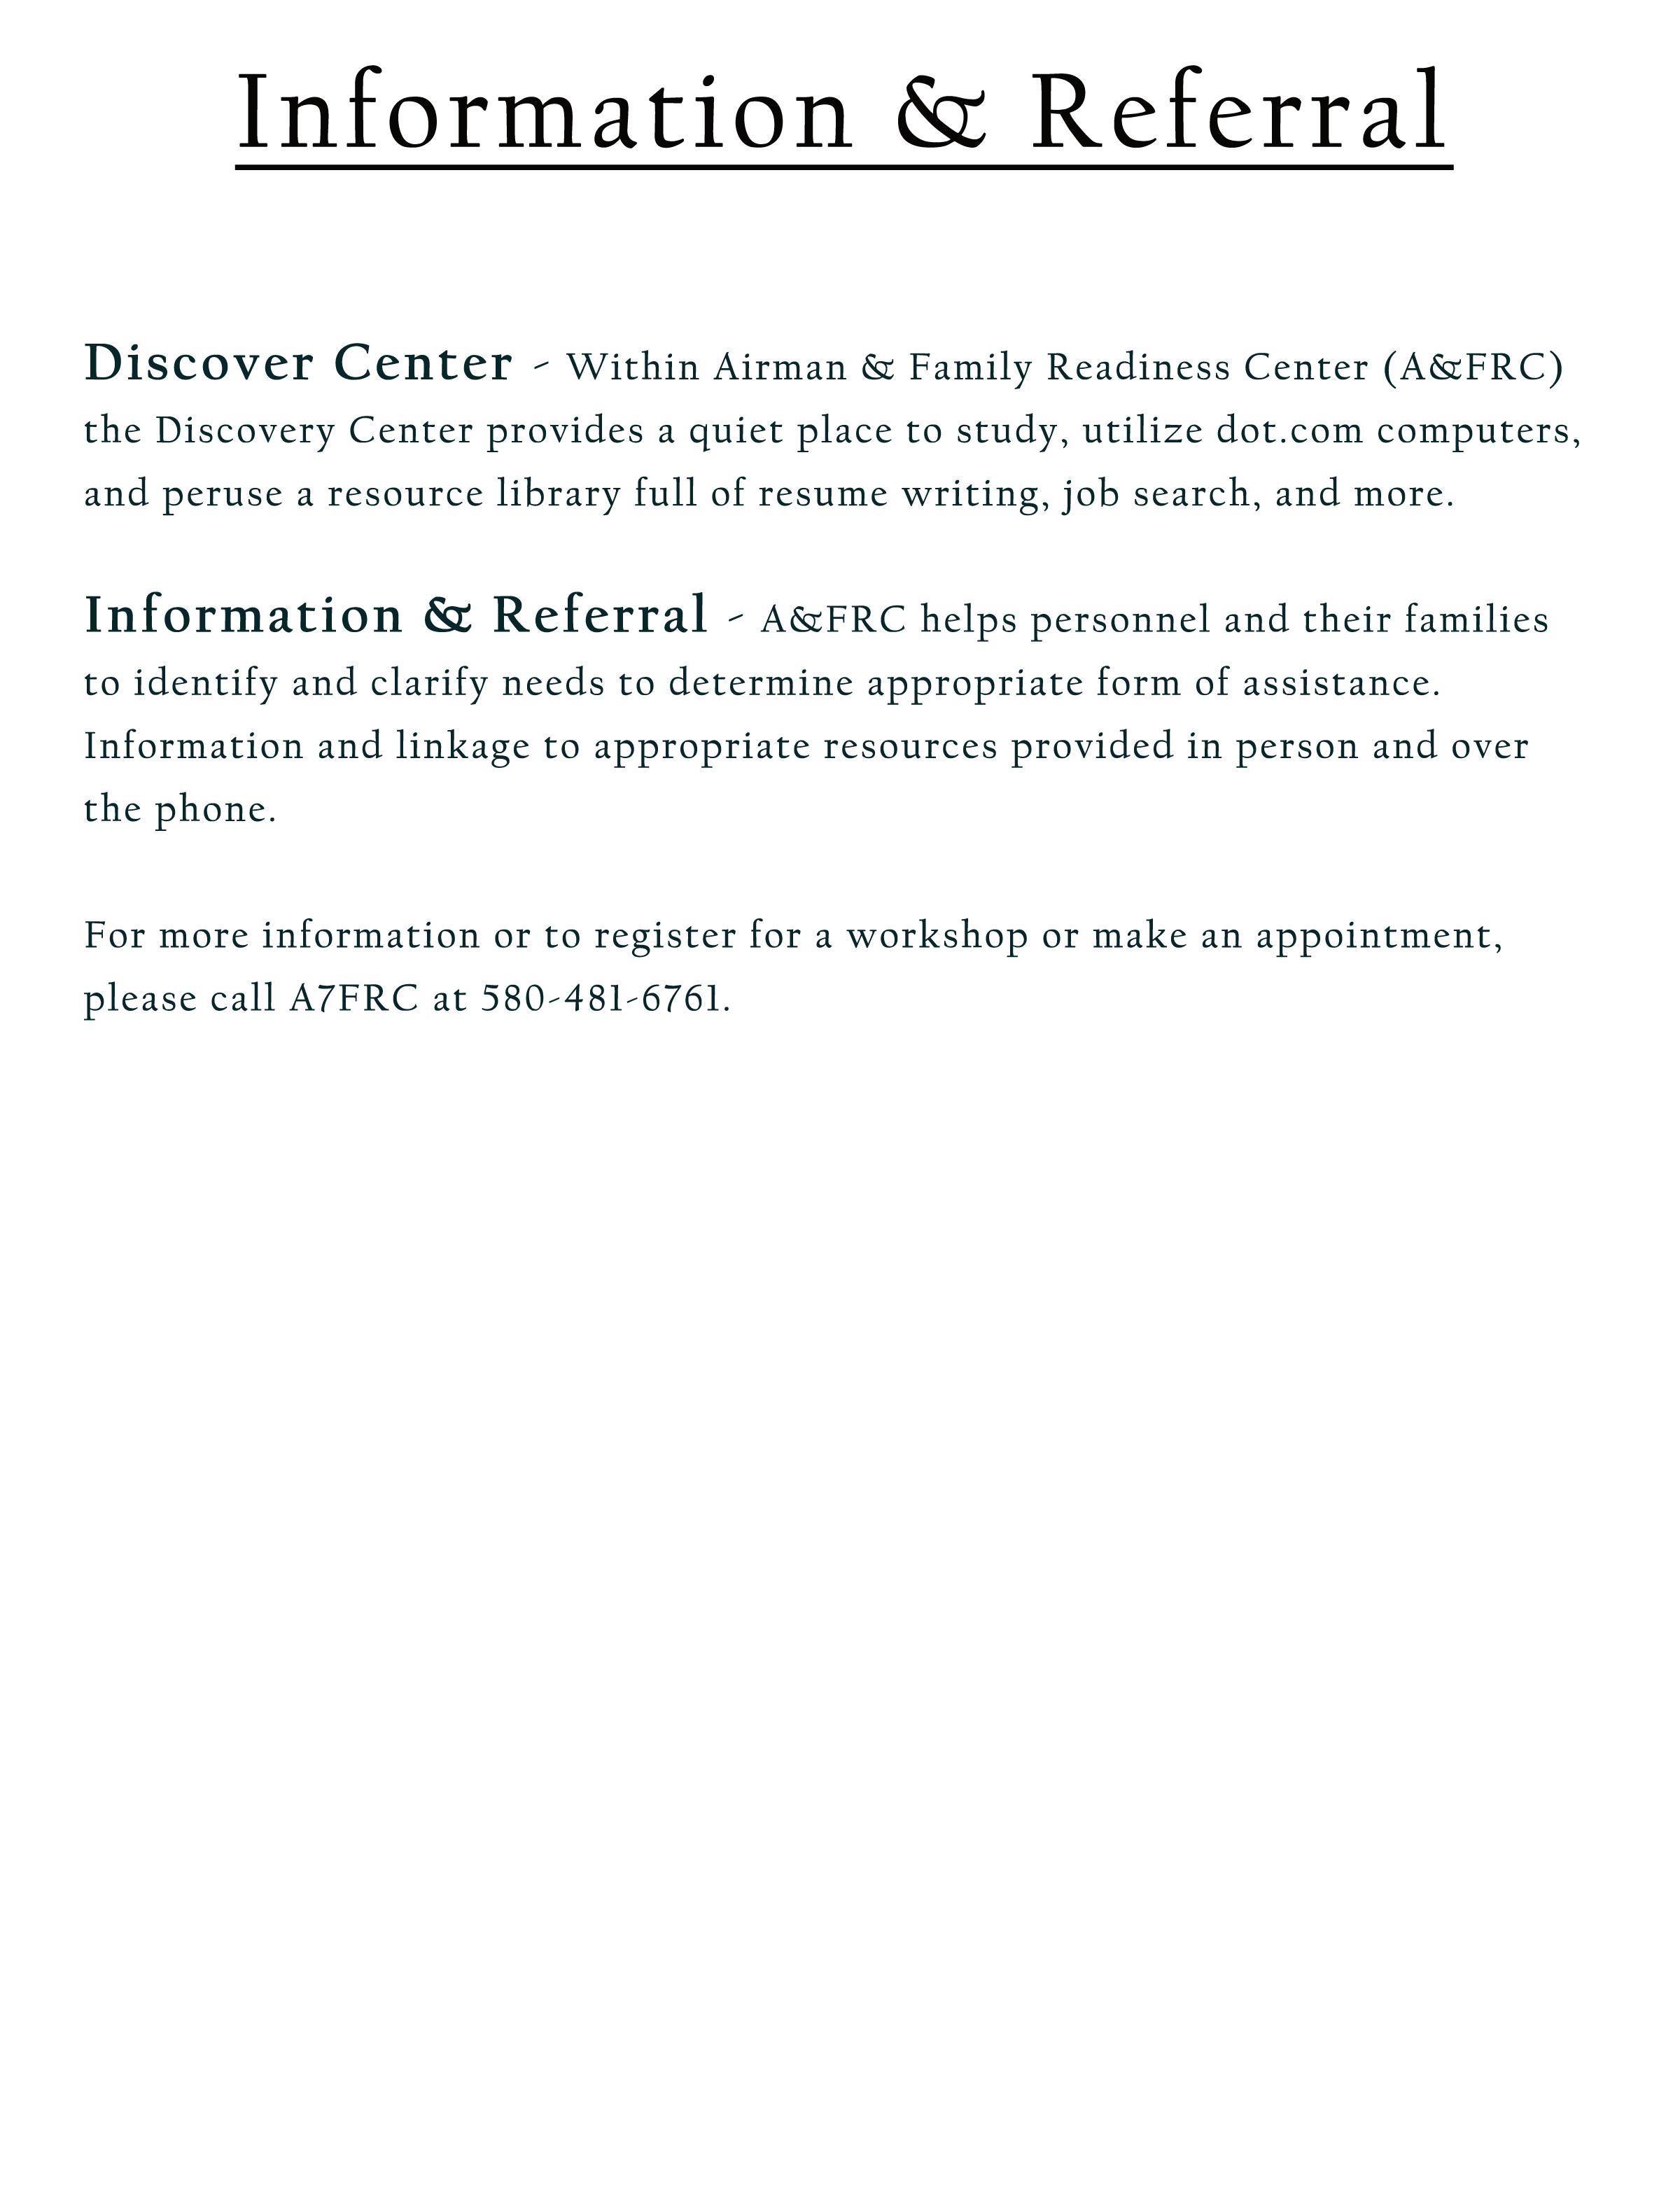 Airman Family Readiness Center Altus Fss